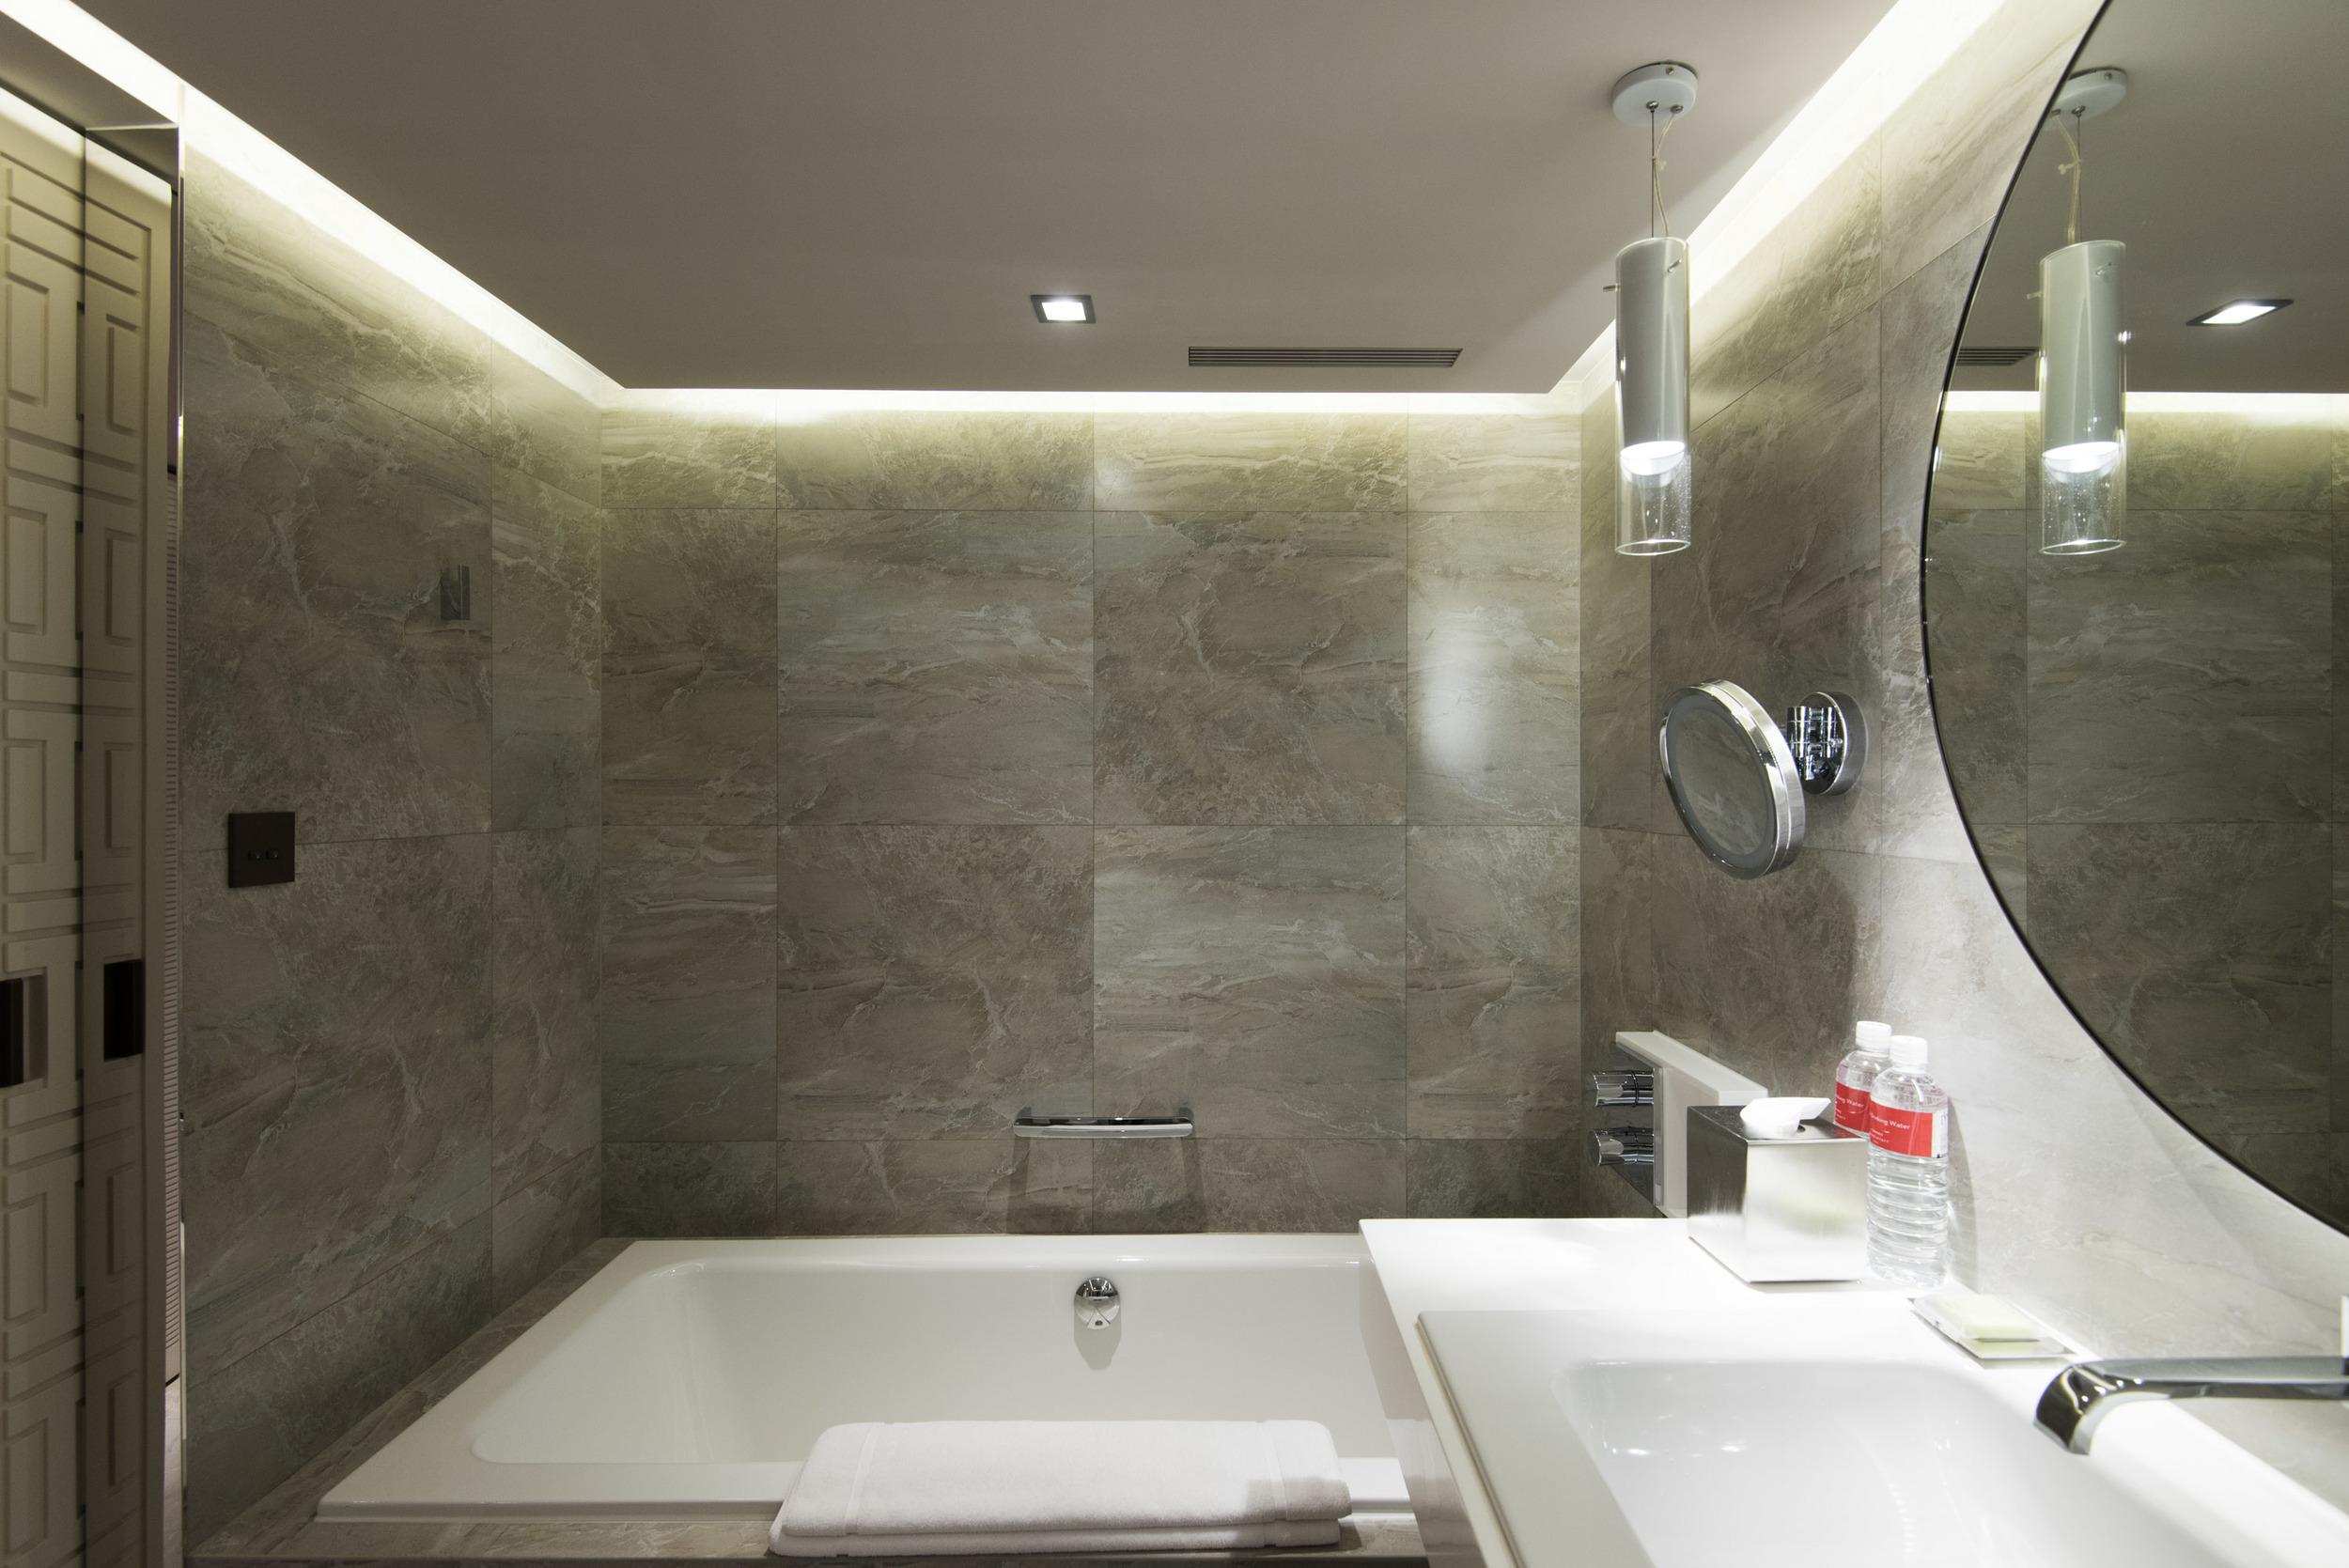 Grand Deluxe Room (Bathtub) - Grand Hyatt Taipei